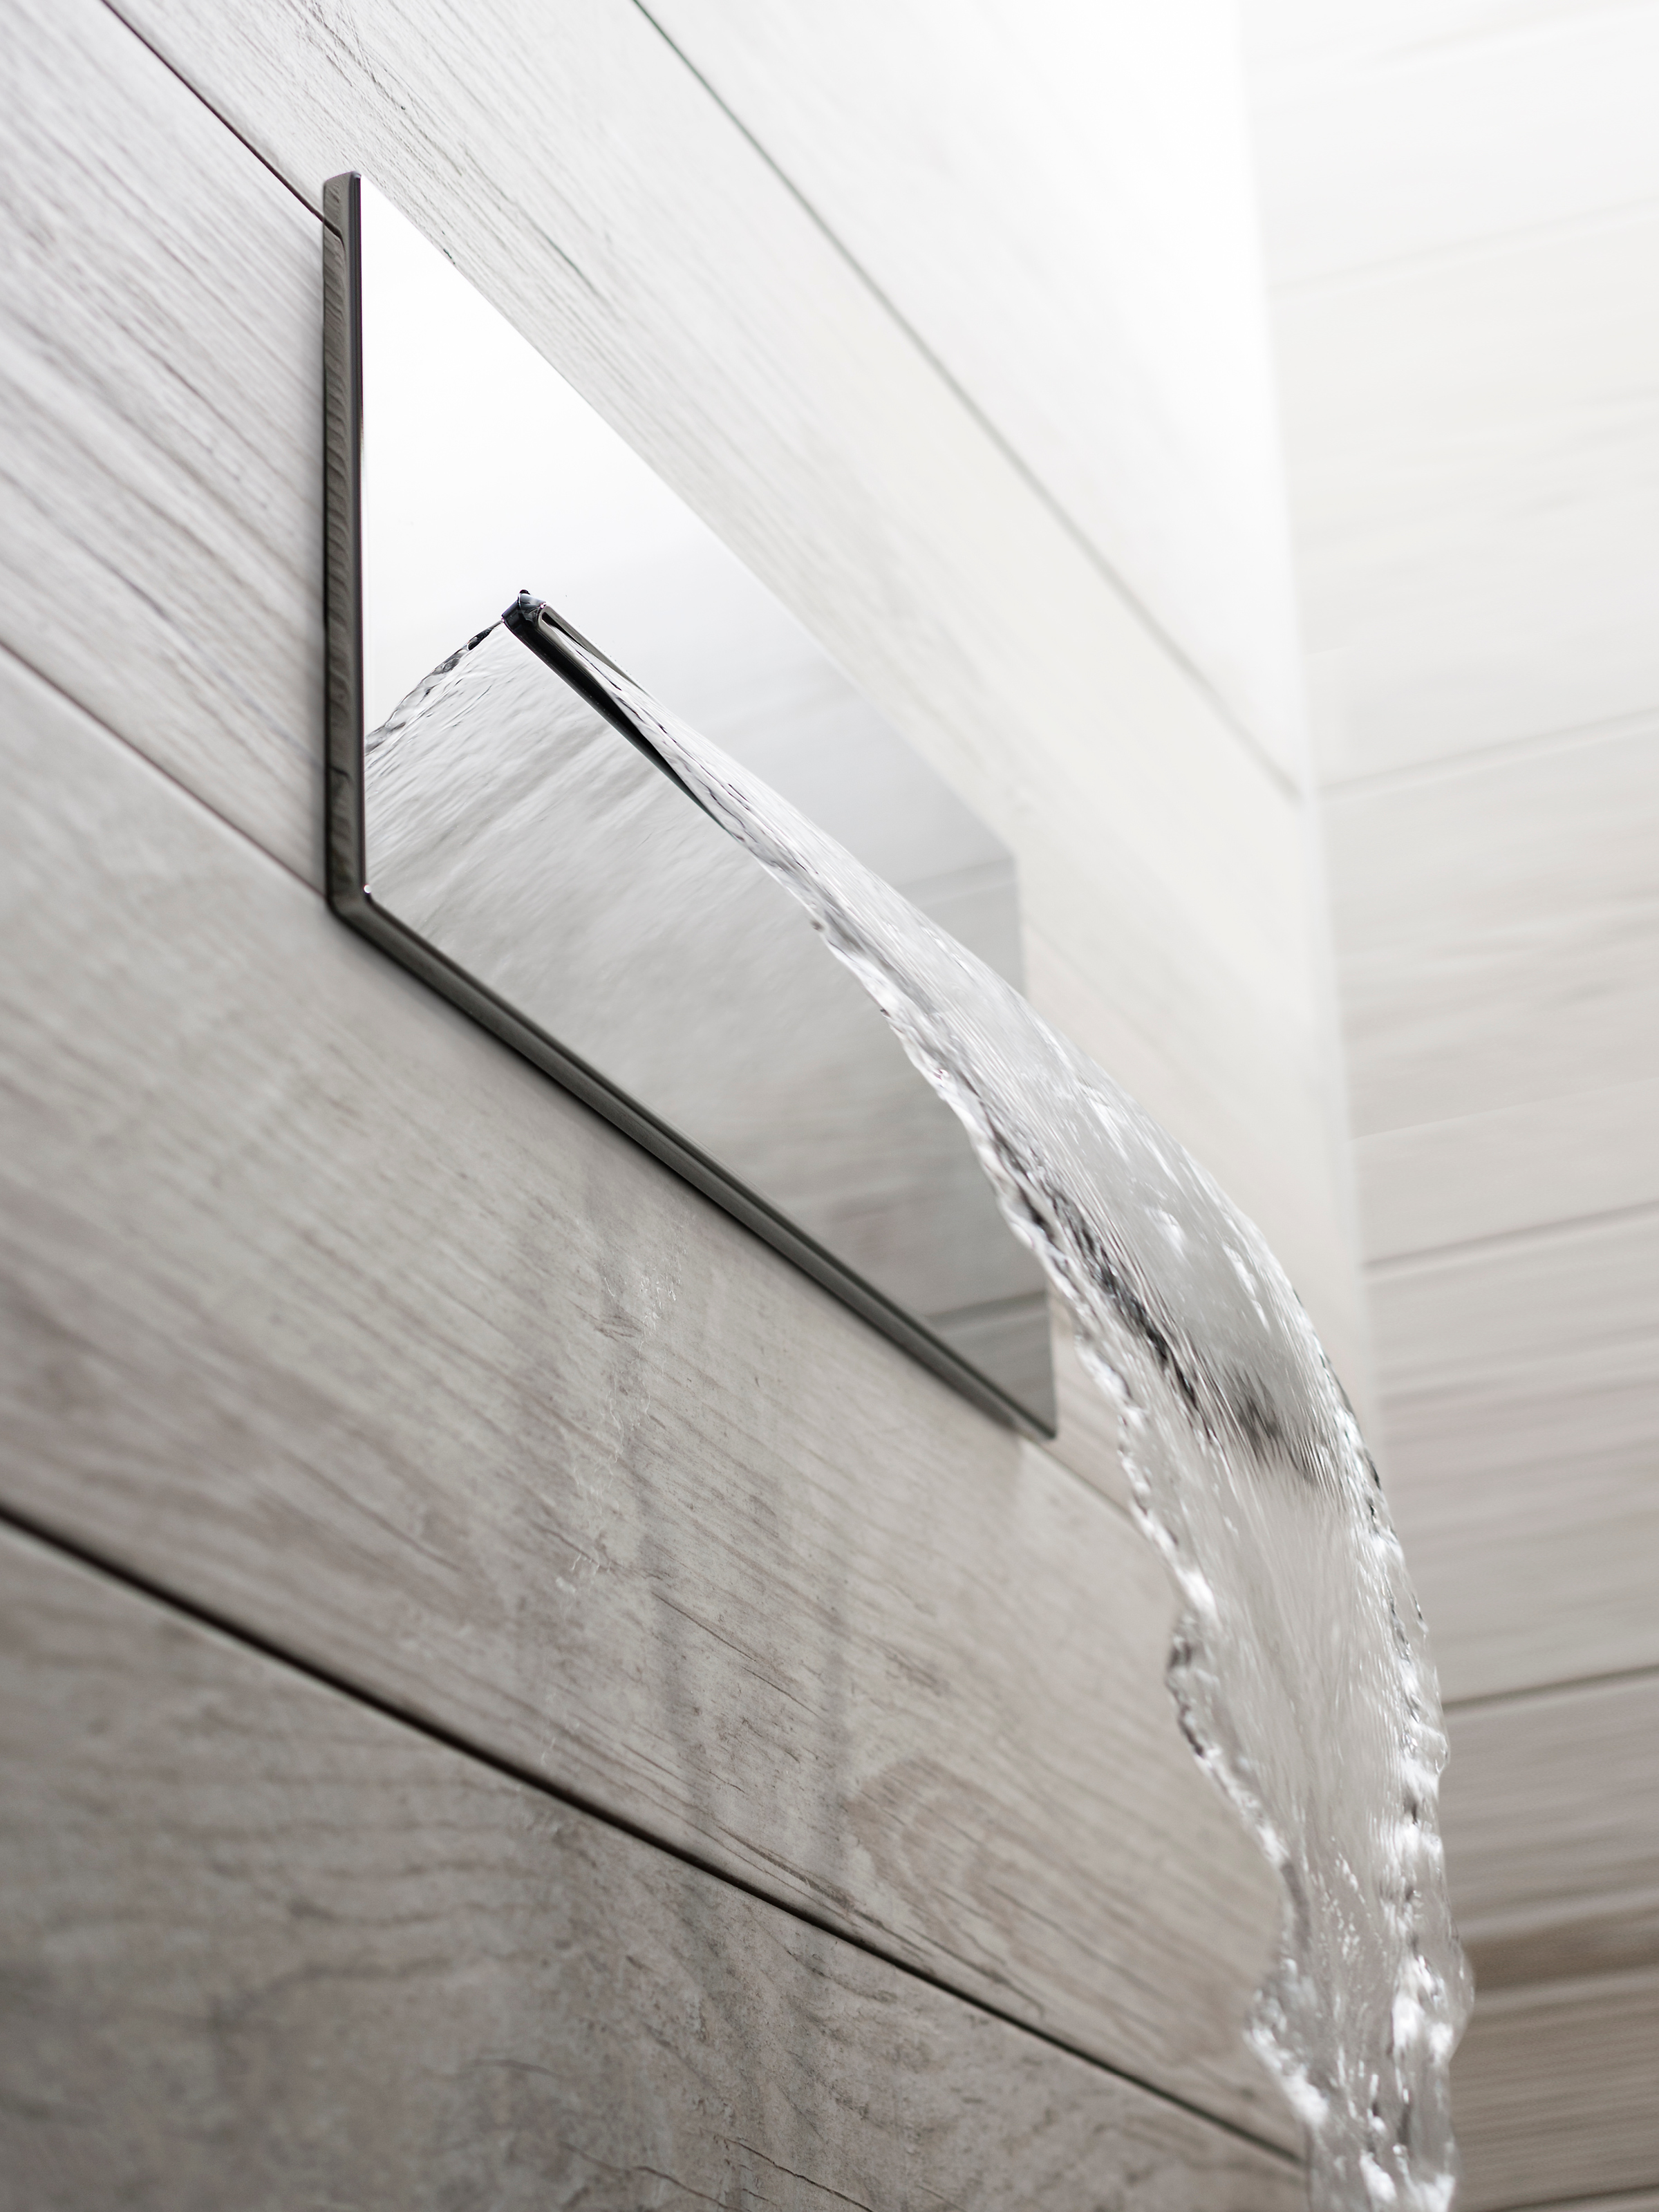 stainless ss head waterfall rain bathroom rainfall steel panels showering shower panel pl